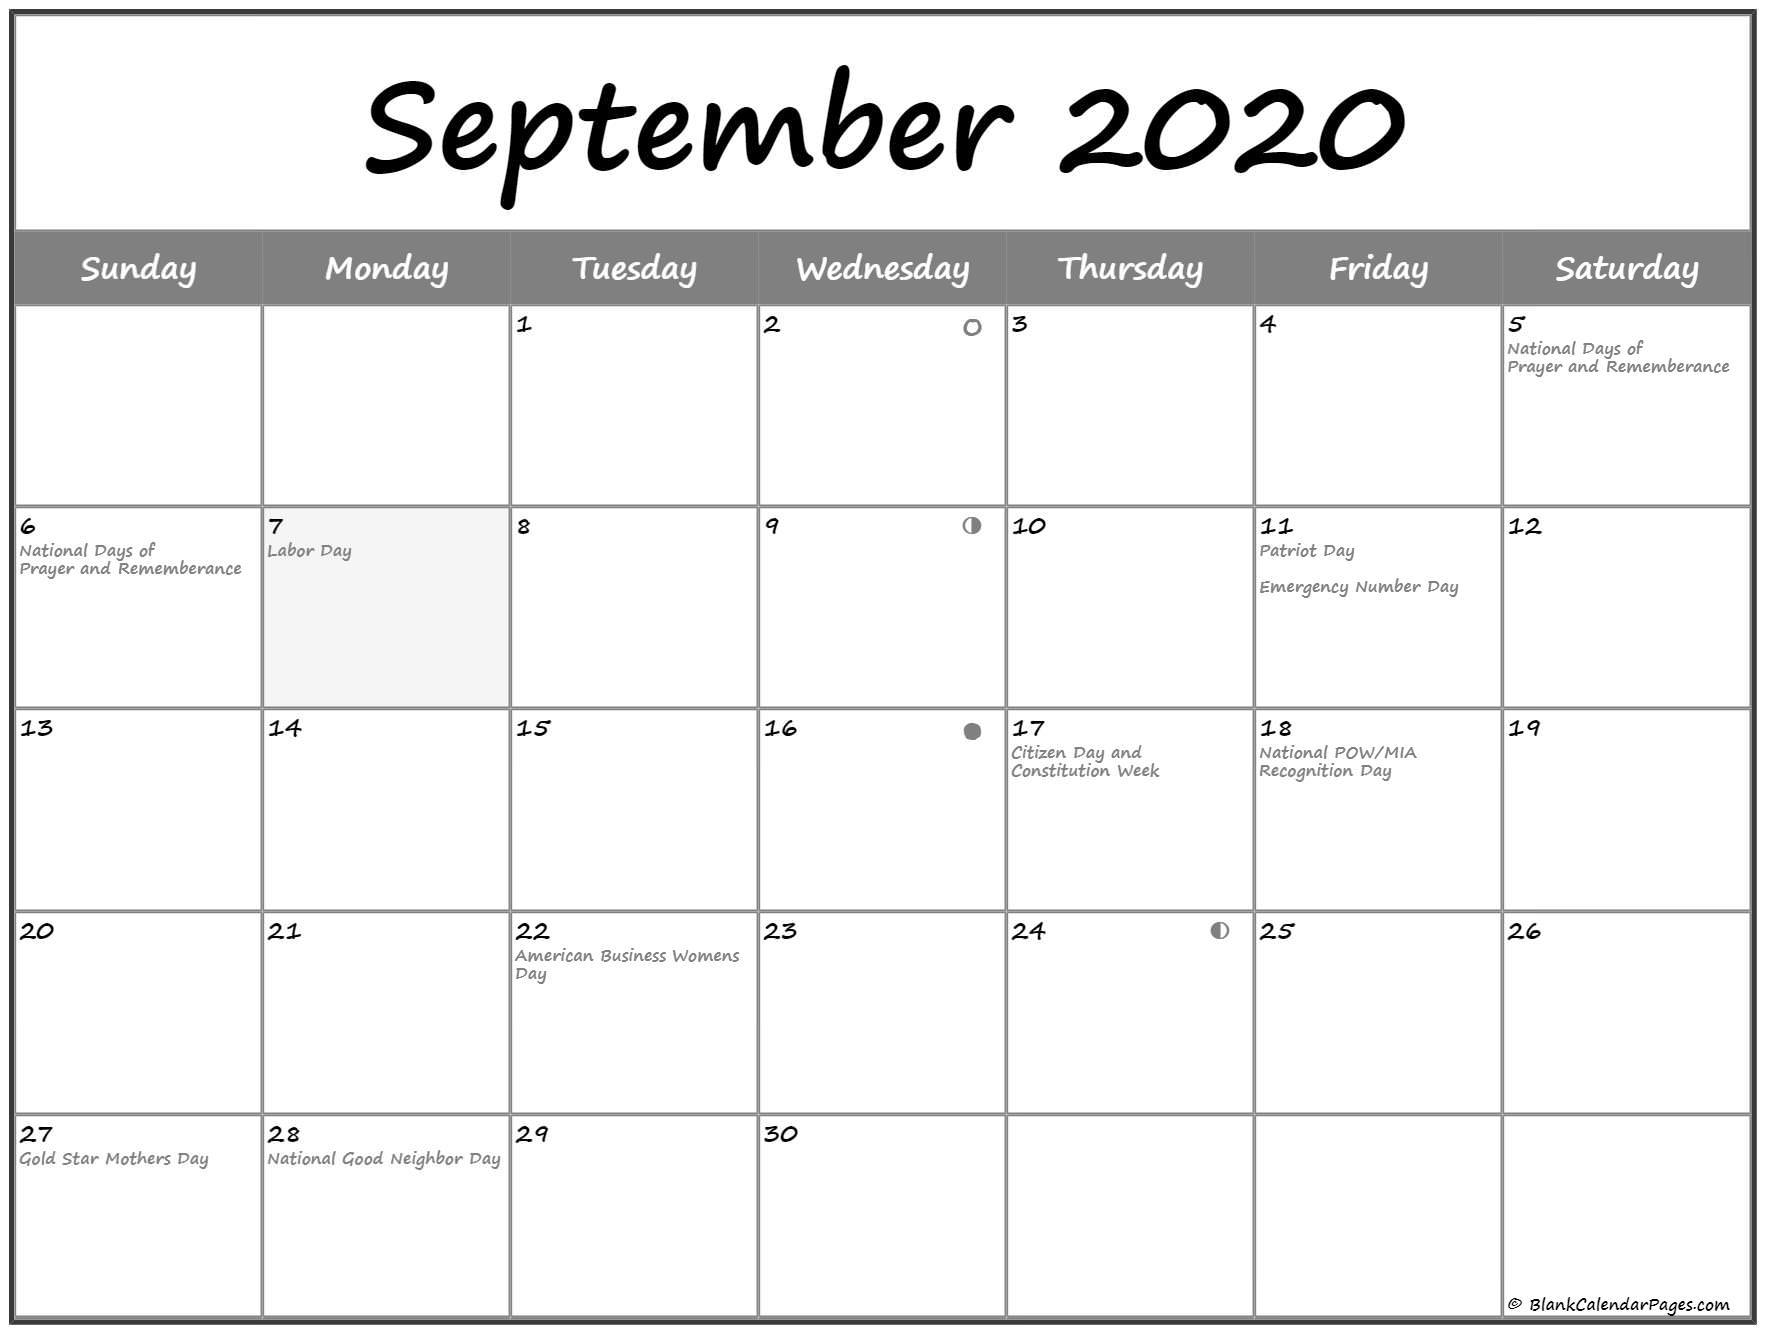 September 2020 Lunar Calendar   Moon Phase Calendar